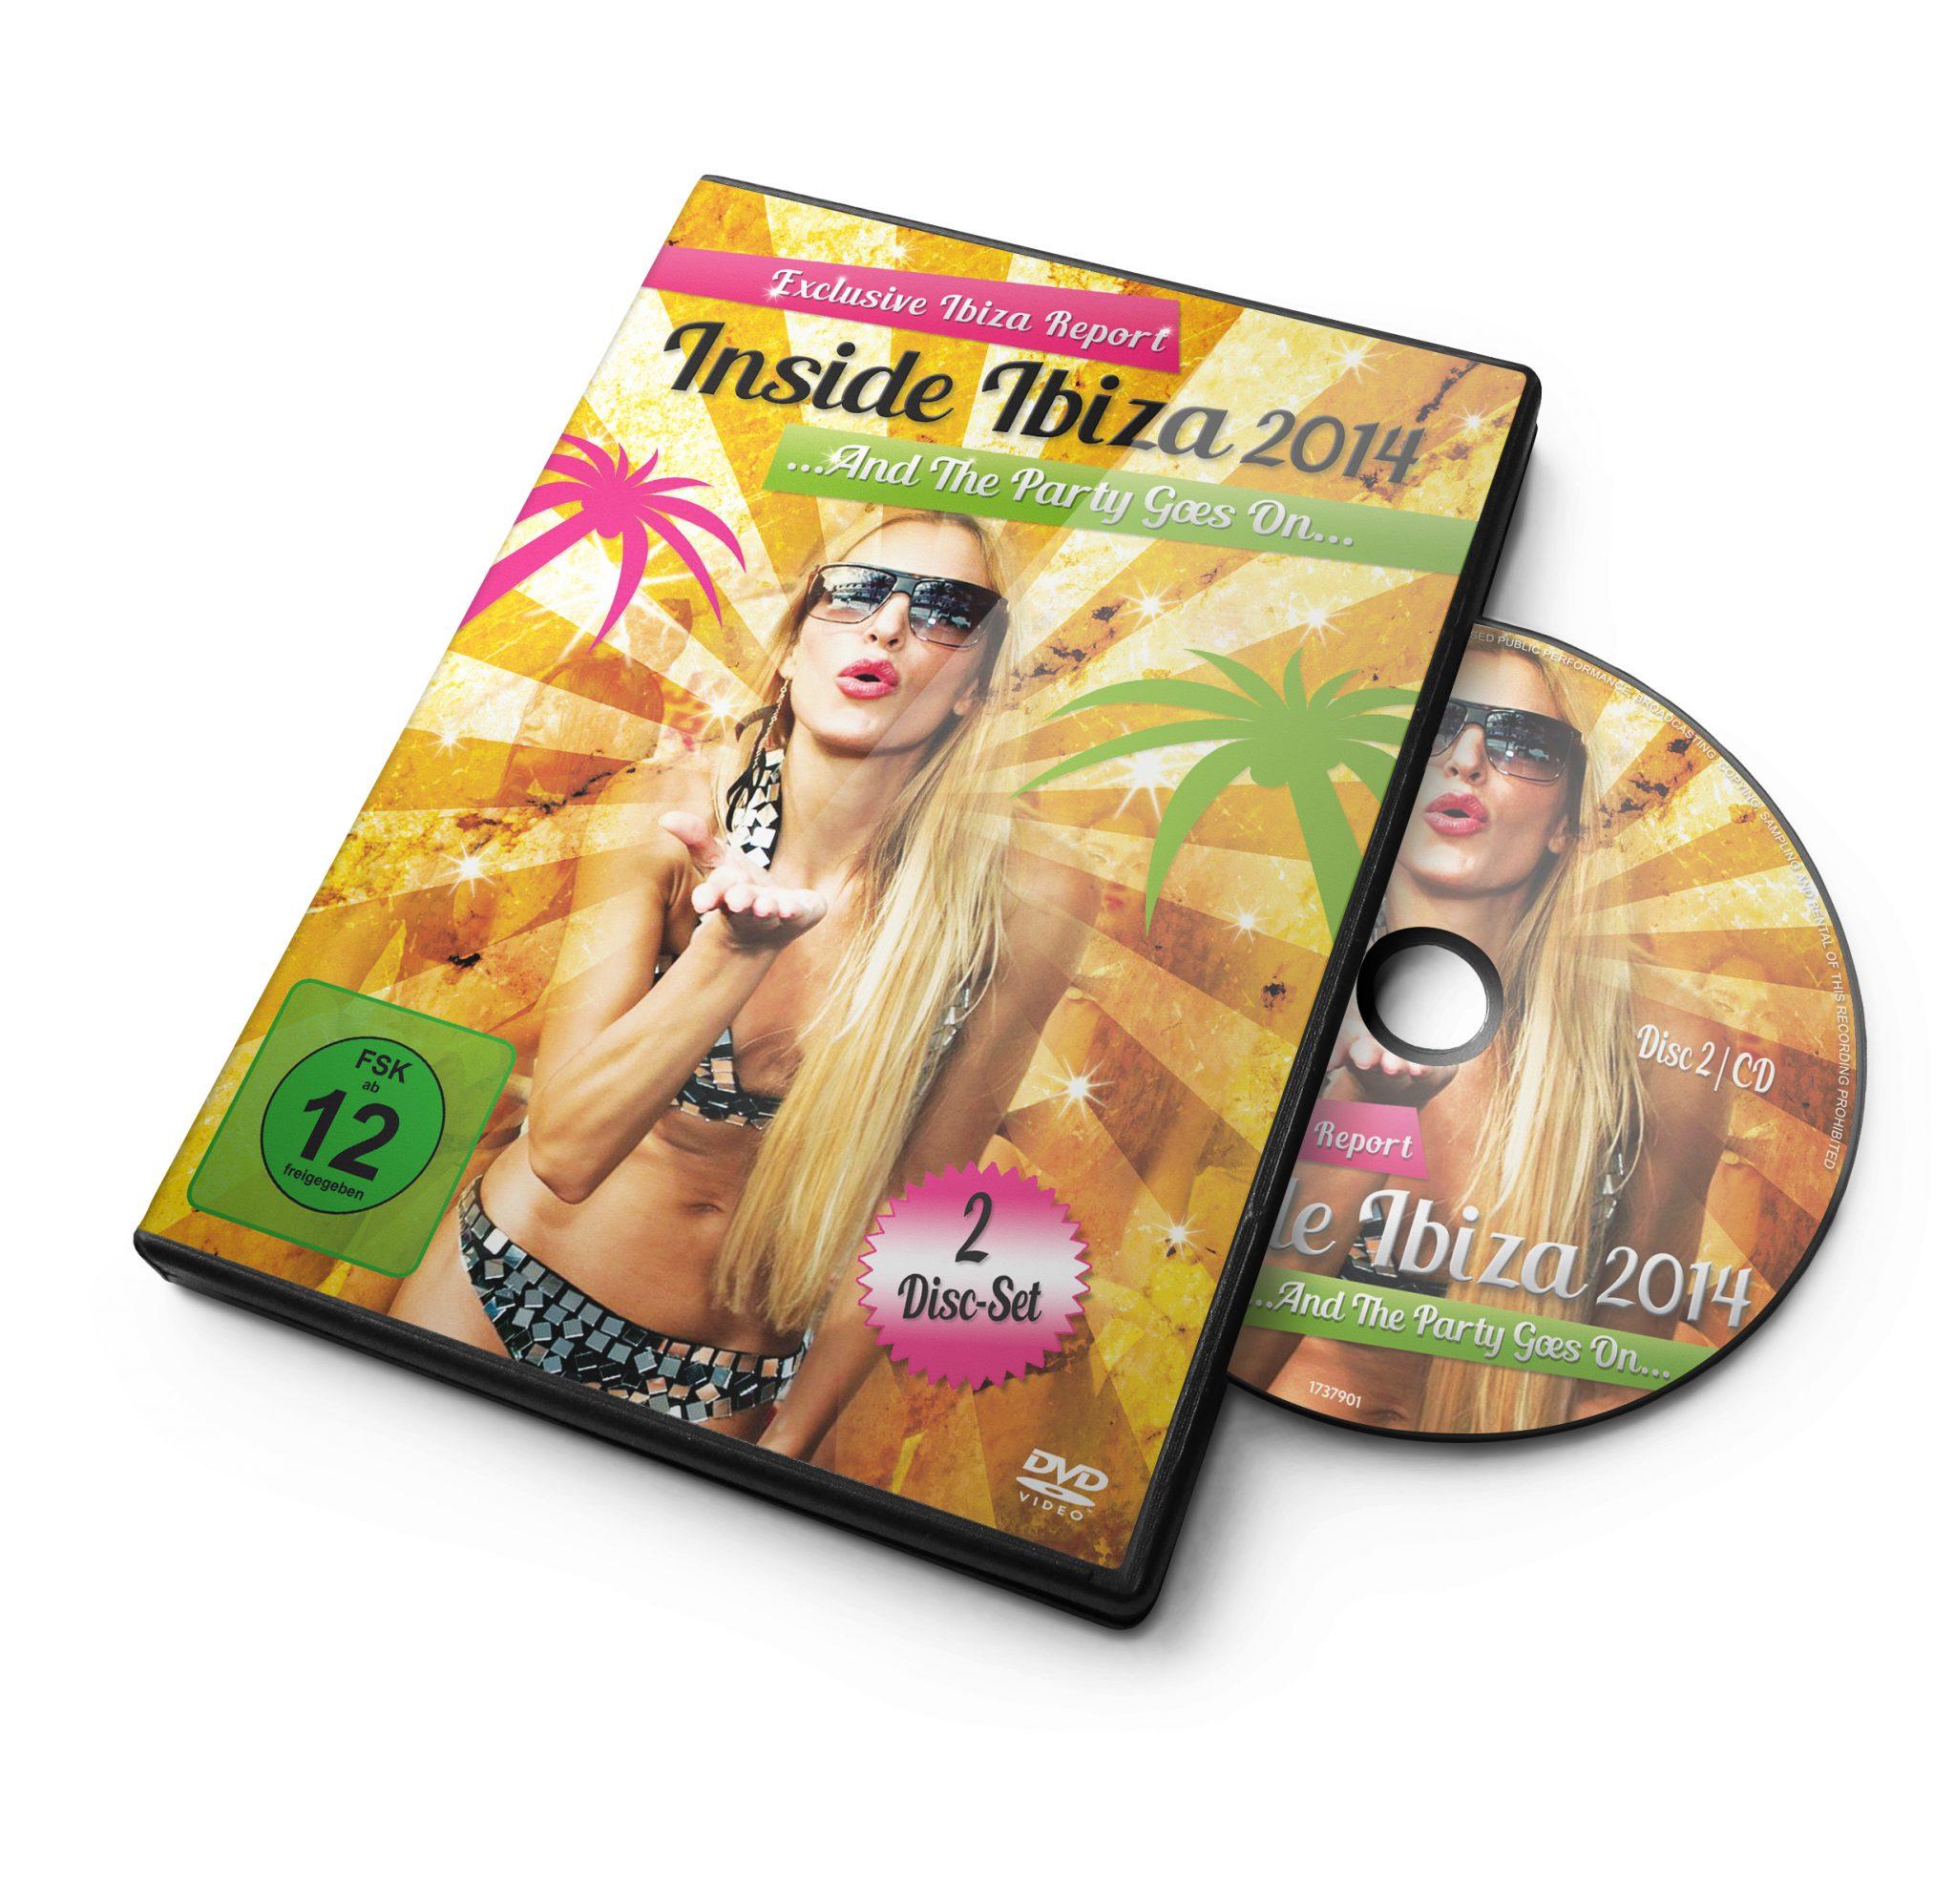 inside ibiza 14_dvd